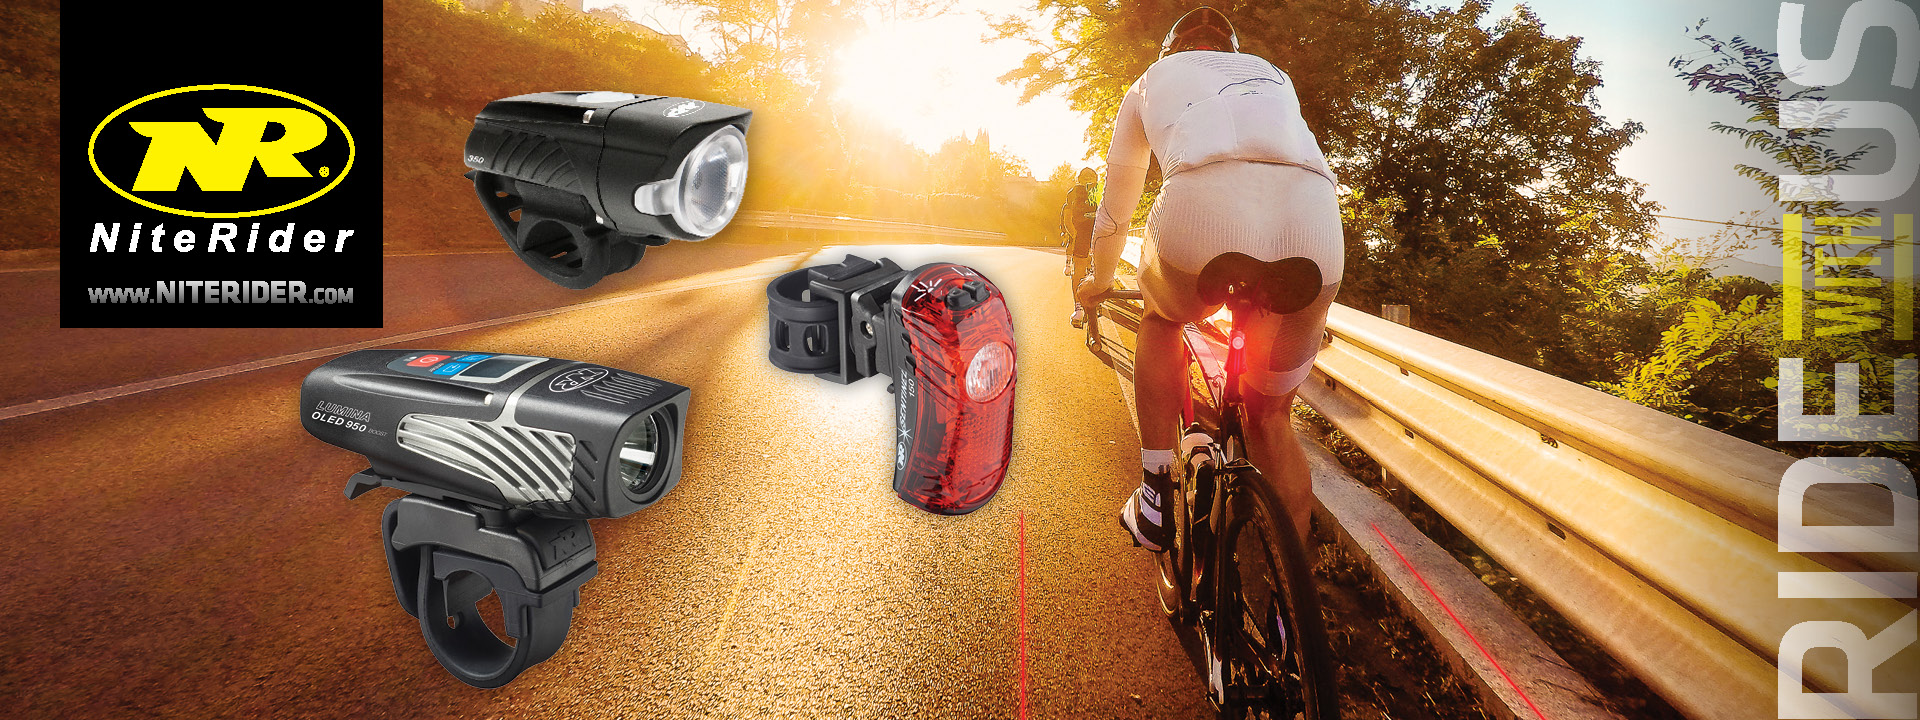 NiteRider-Bike-Lights-TPWbike-1920x720.jpg